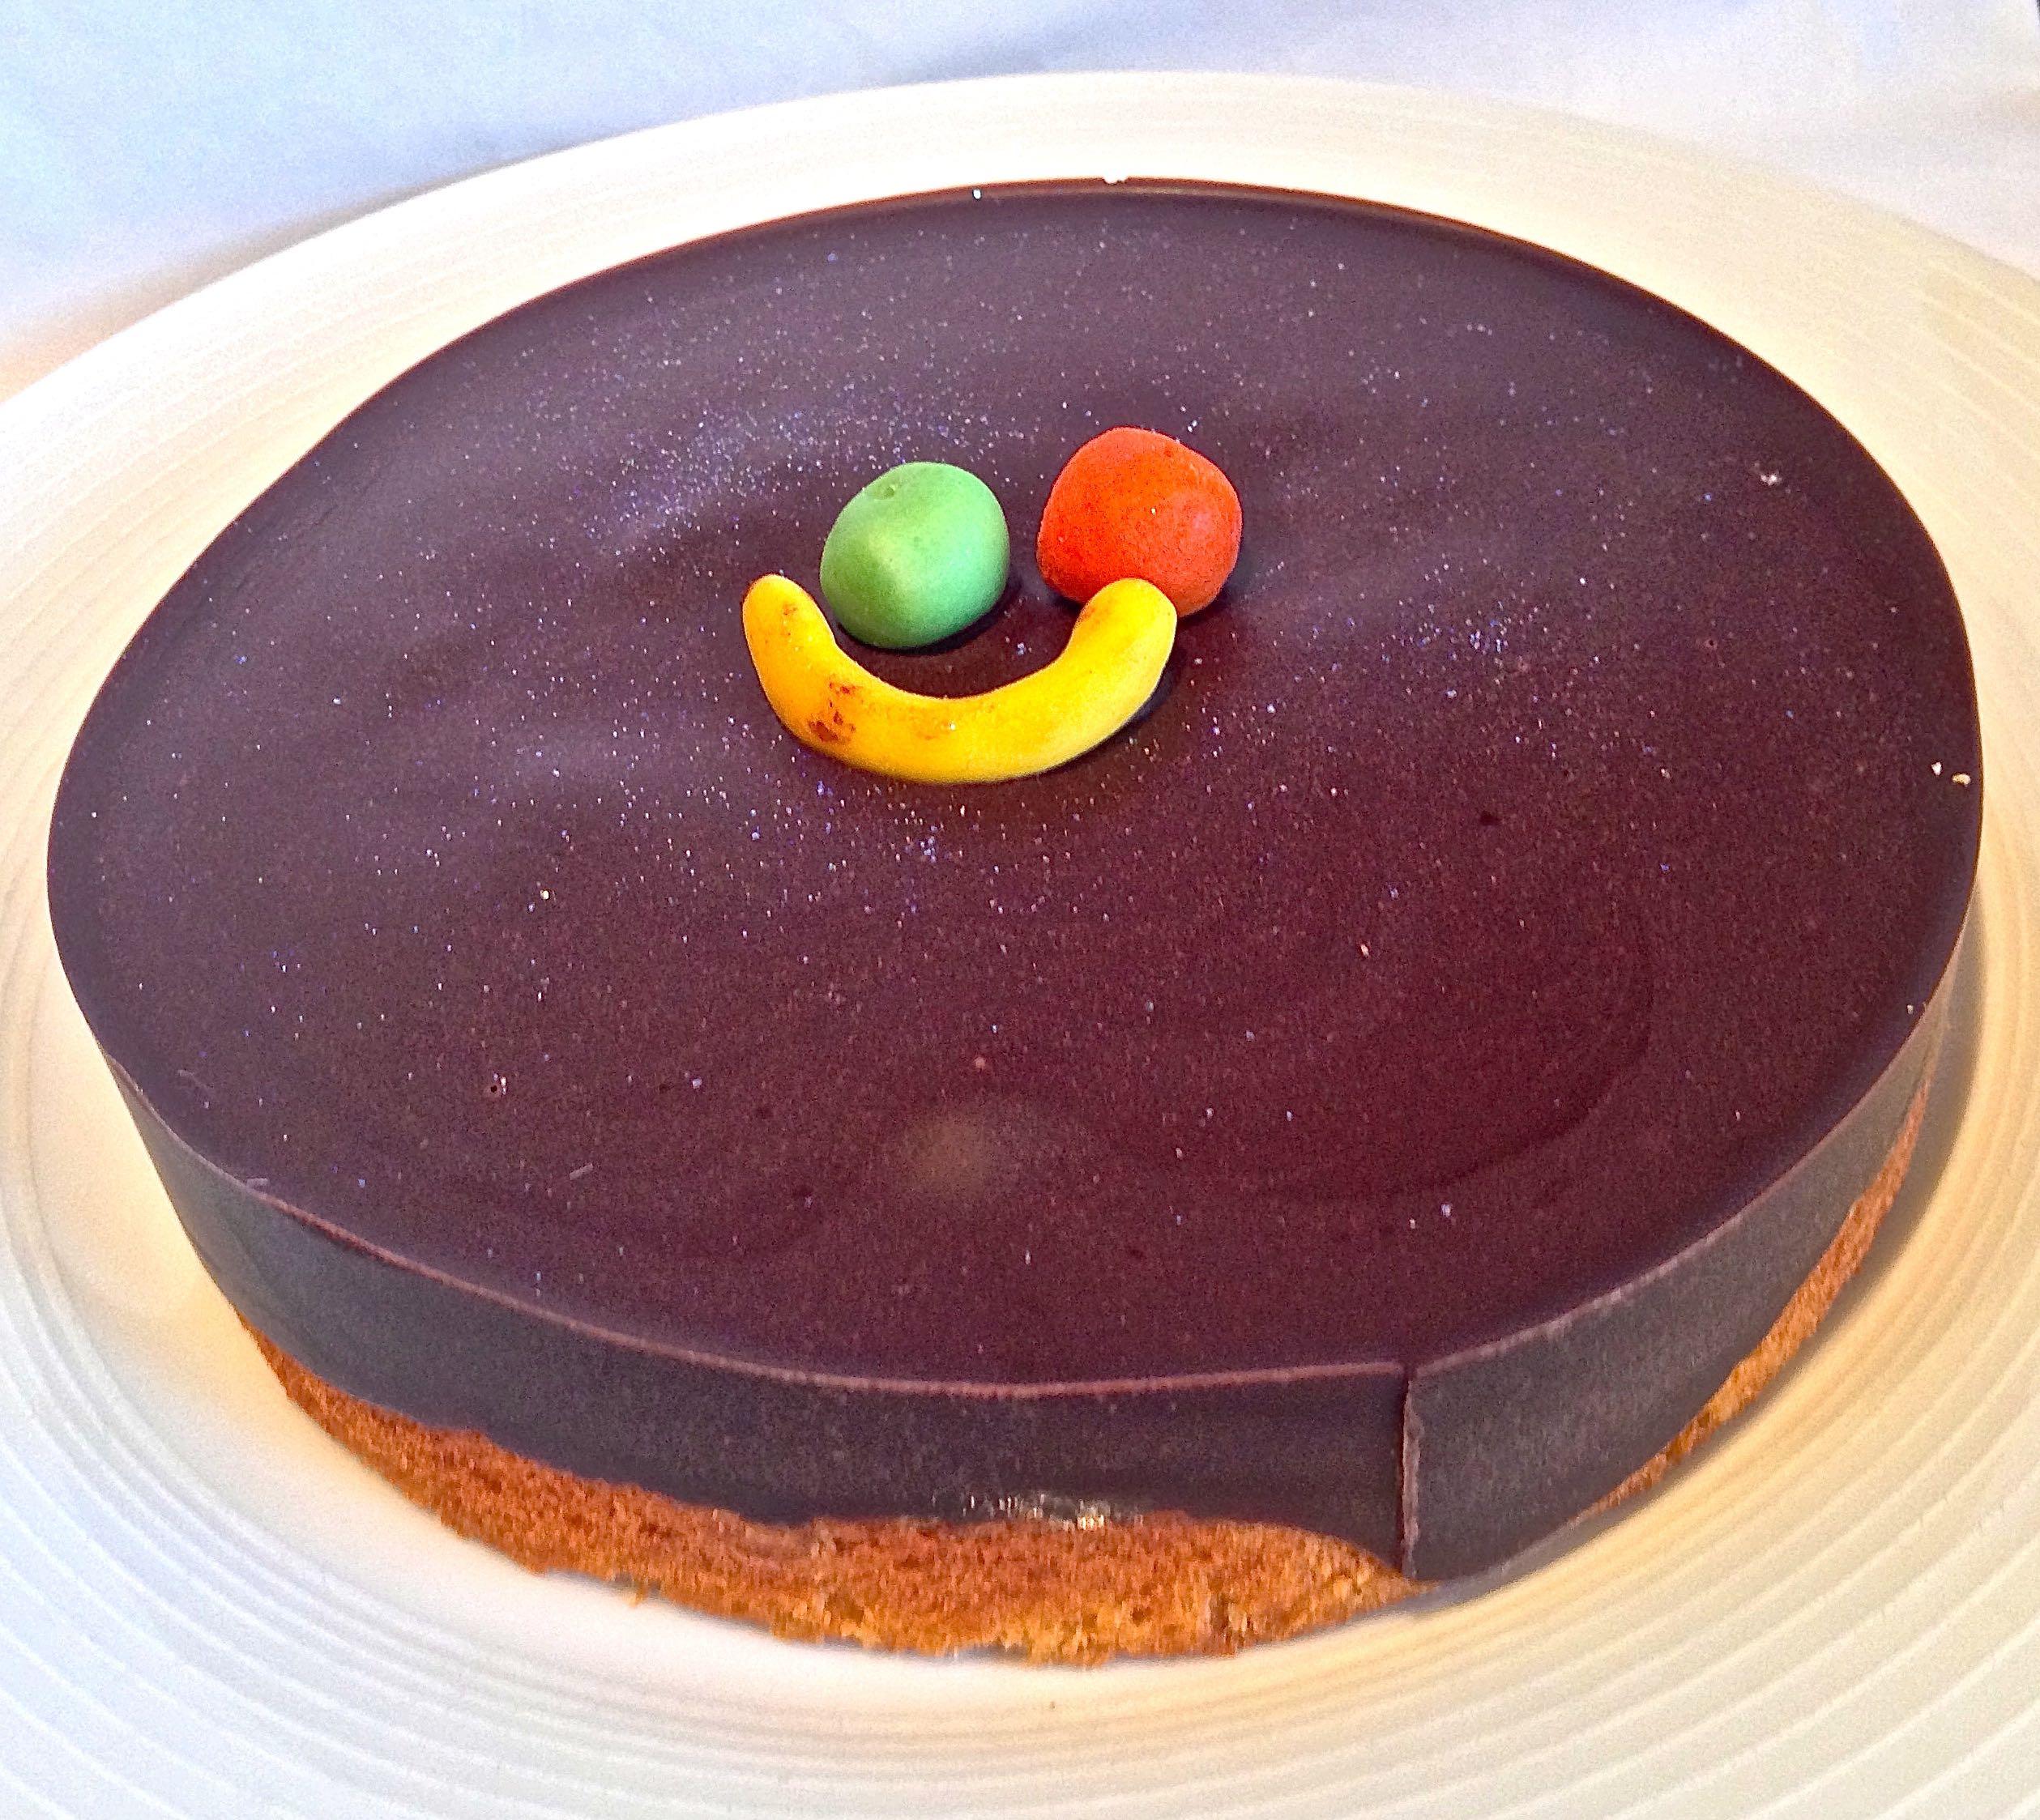 Tunis Cake A British Christmas Tradition